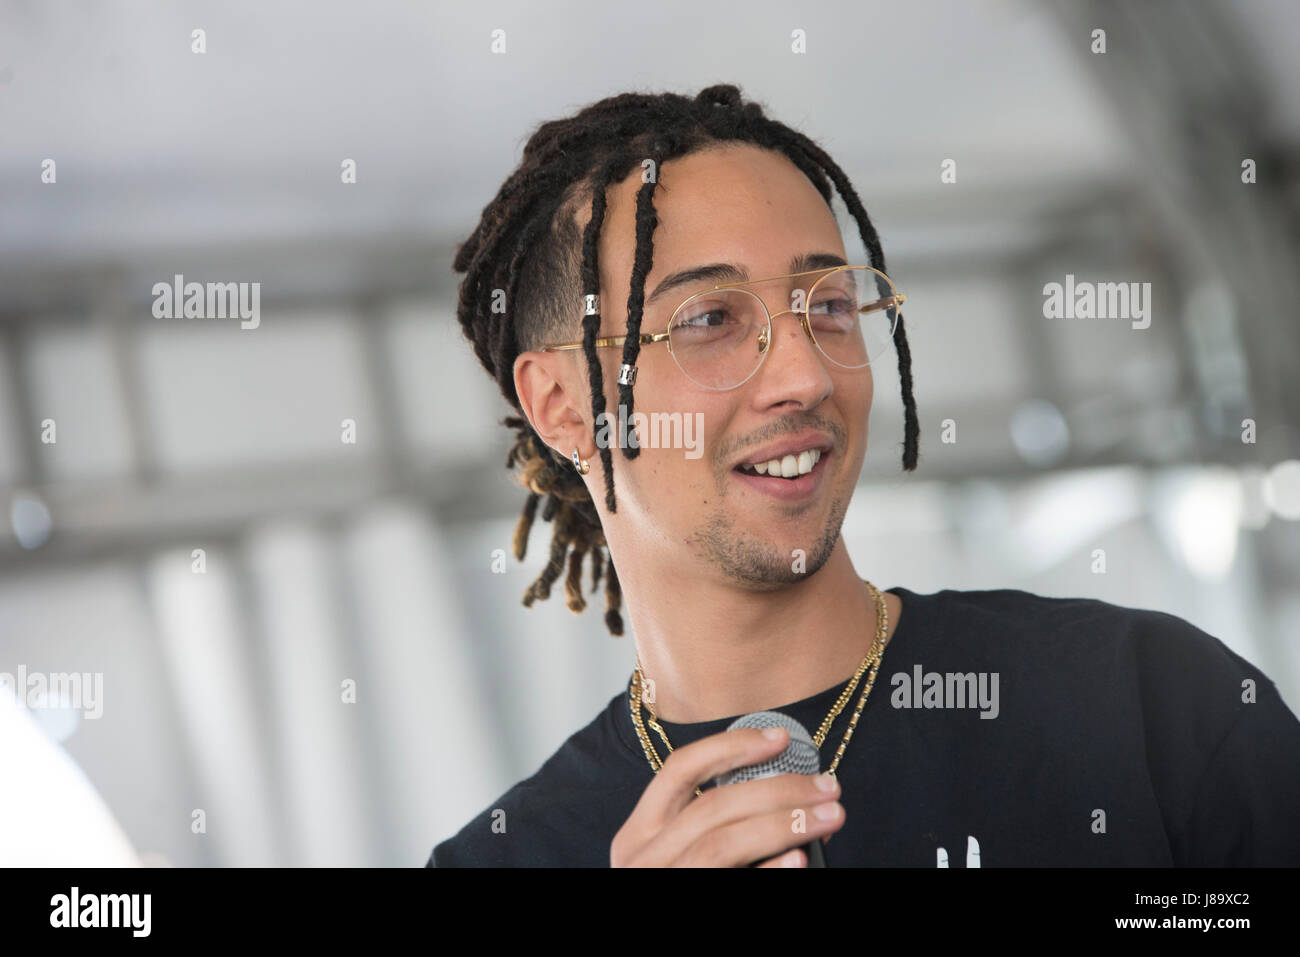 Ghali Amdouni An Italian Rapper Of Tunisian Origins Presents His Album Album And Meet Fans At The Le Due Torri Shopping Center In Stezzano Bergamo